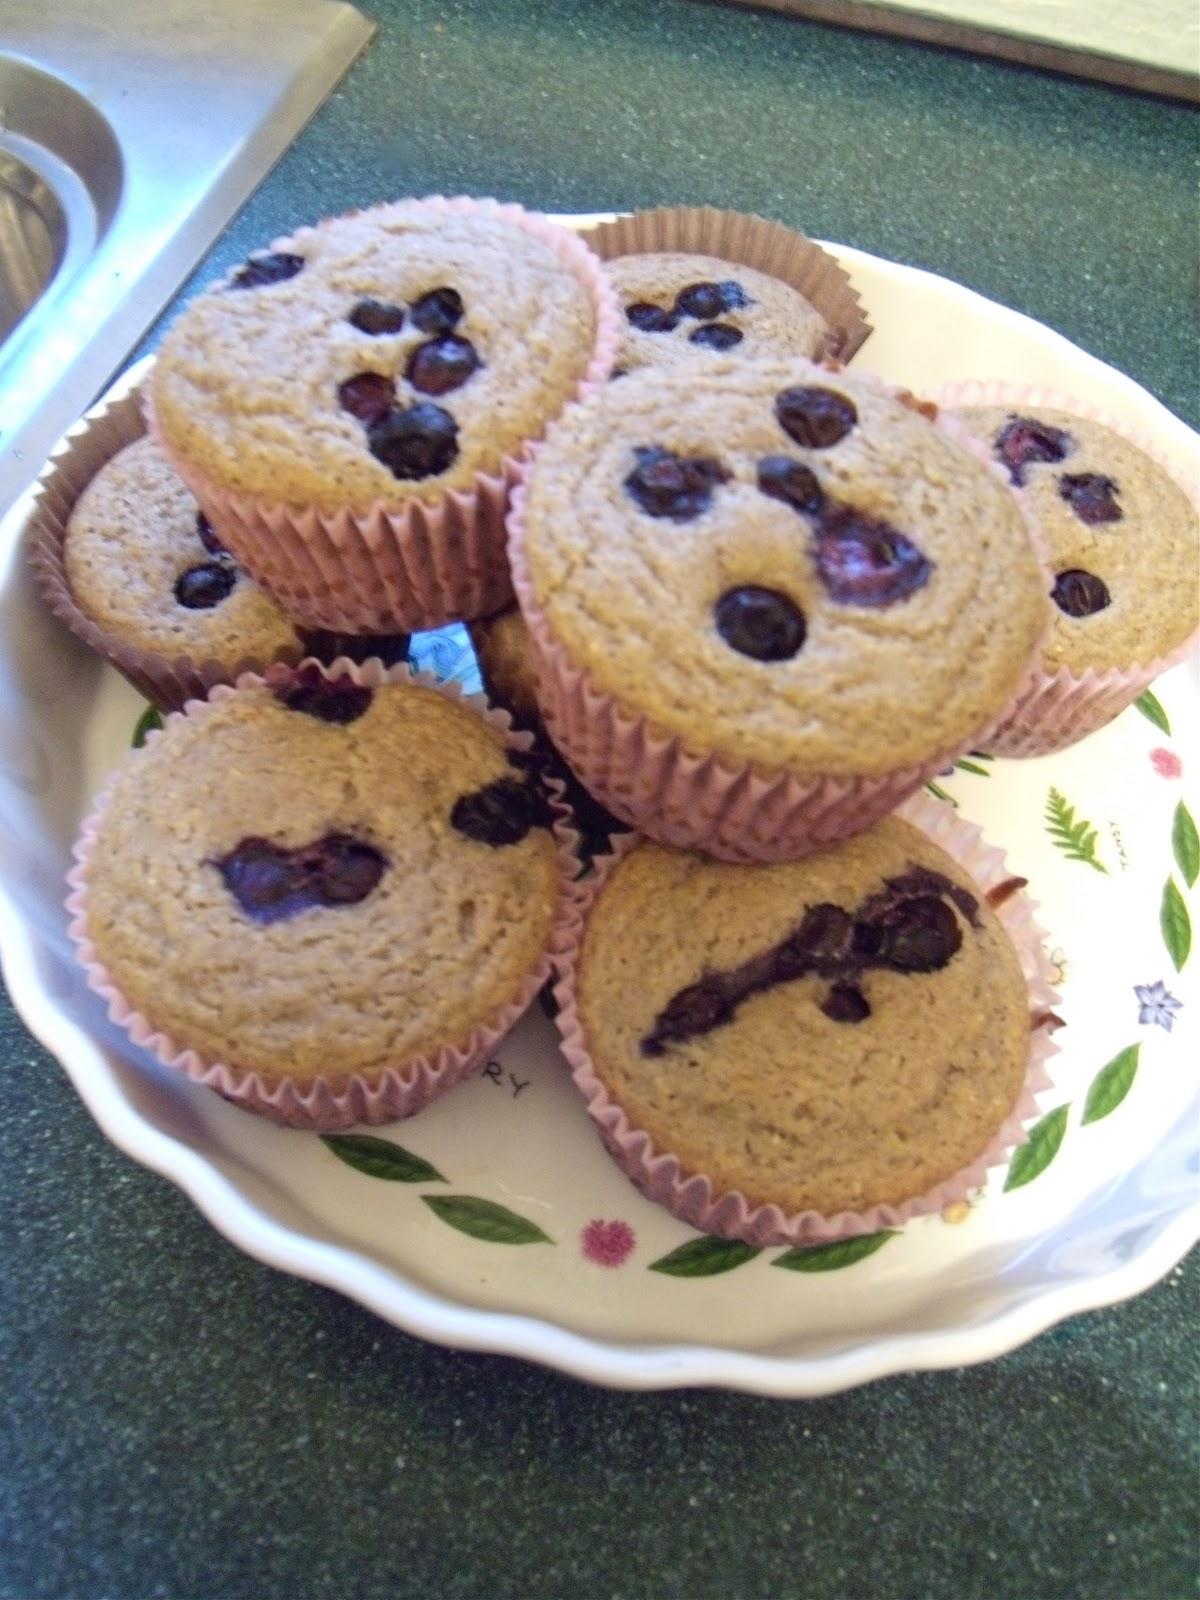 In a Creative Context: Gluten-free Blueberry Buckwheat Corn Muffins